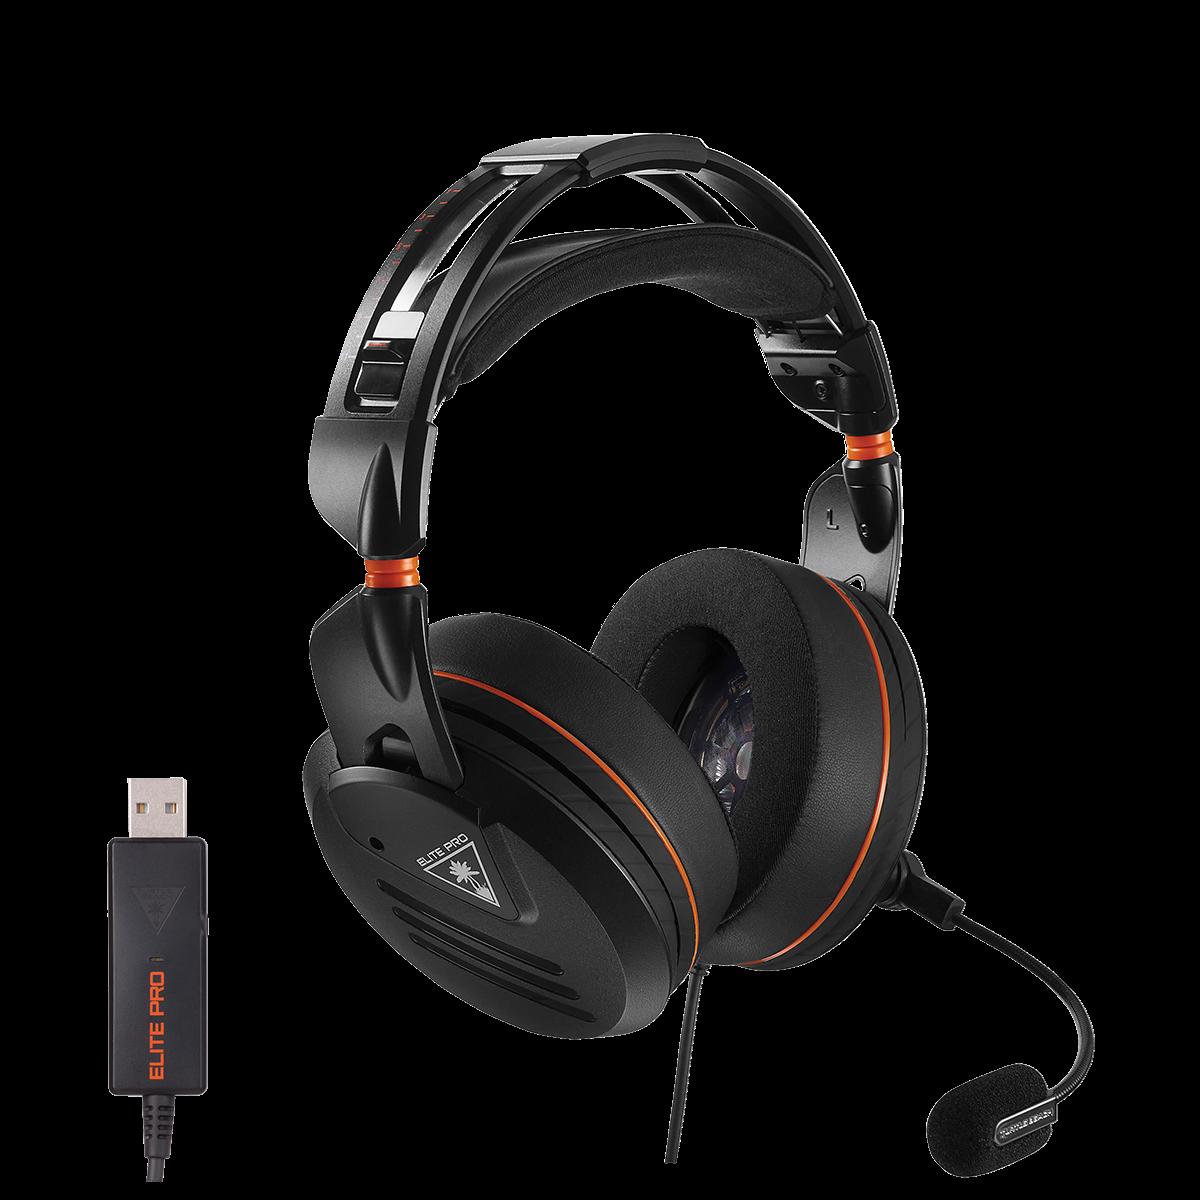 elite pro - surround sound headset - pc edition